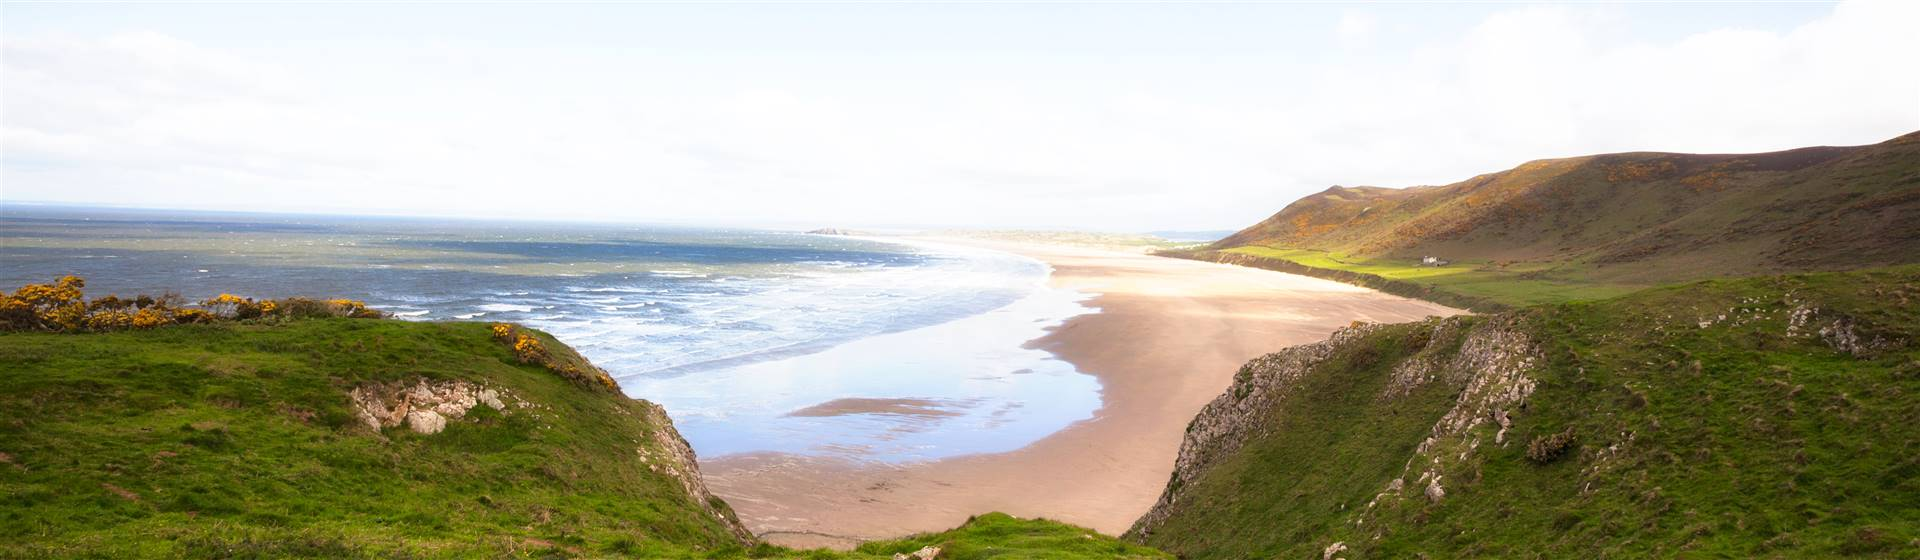 Pembrokeshire Coast: St Davids, Saundersfoot 2022